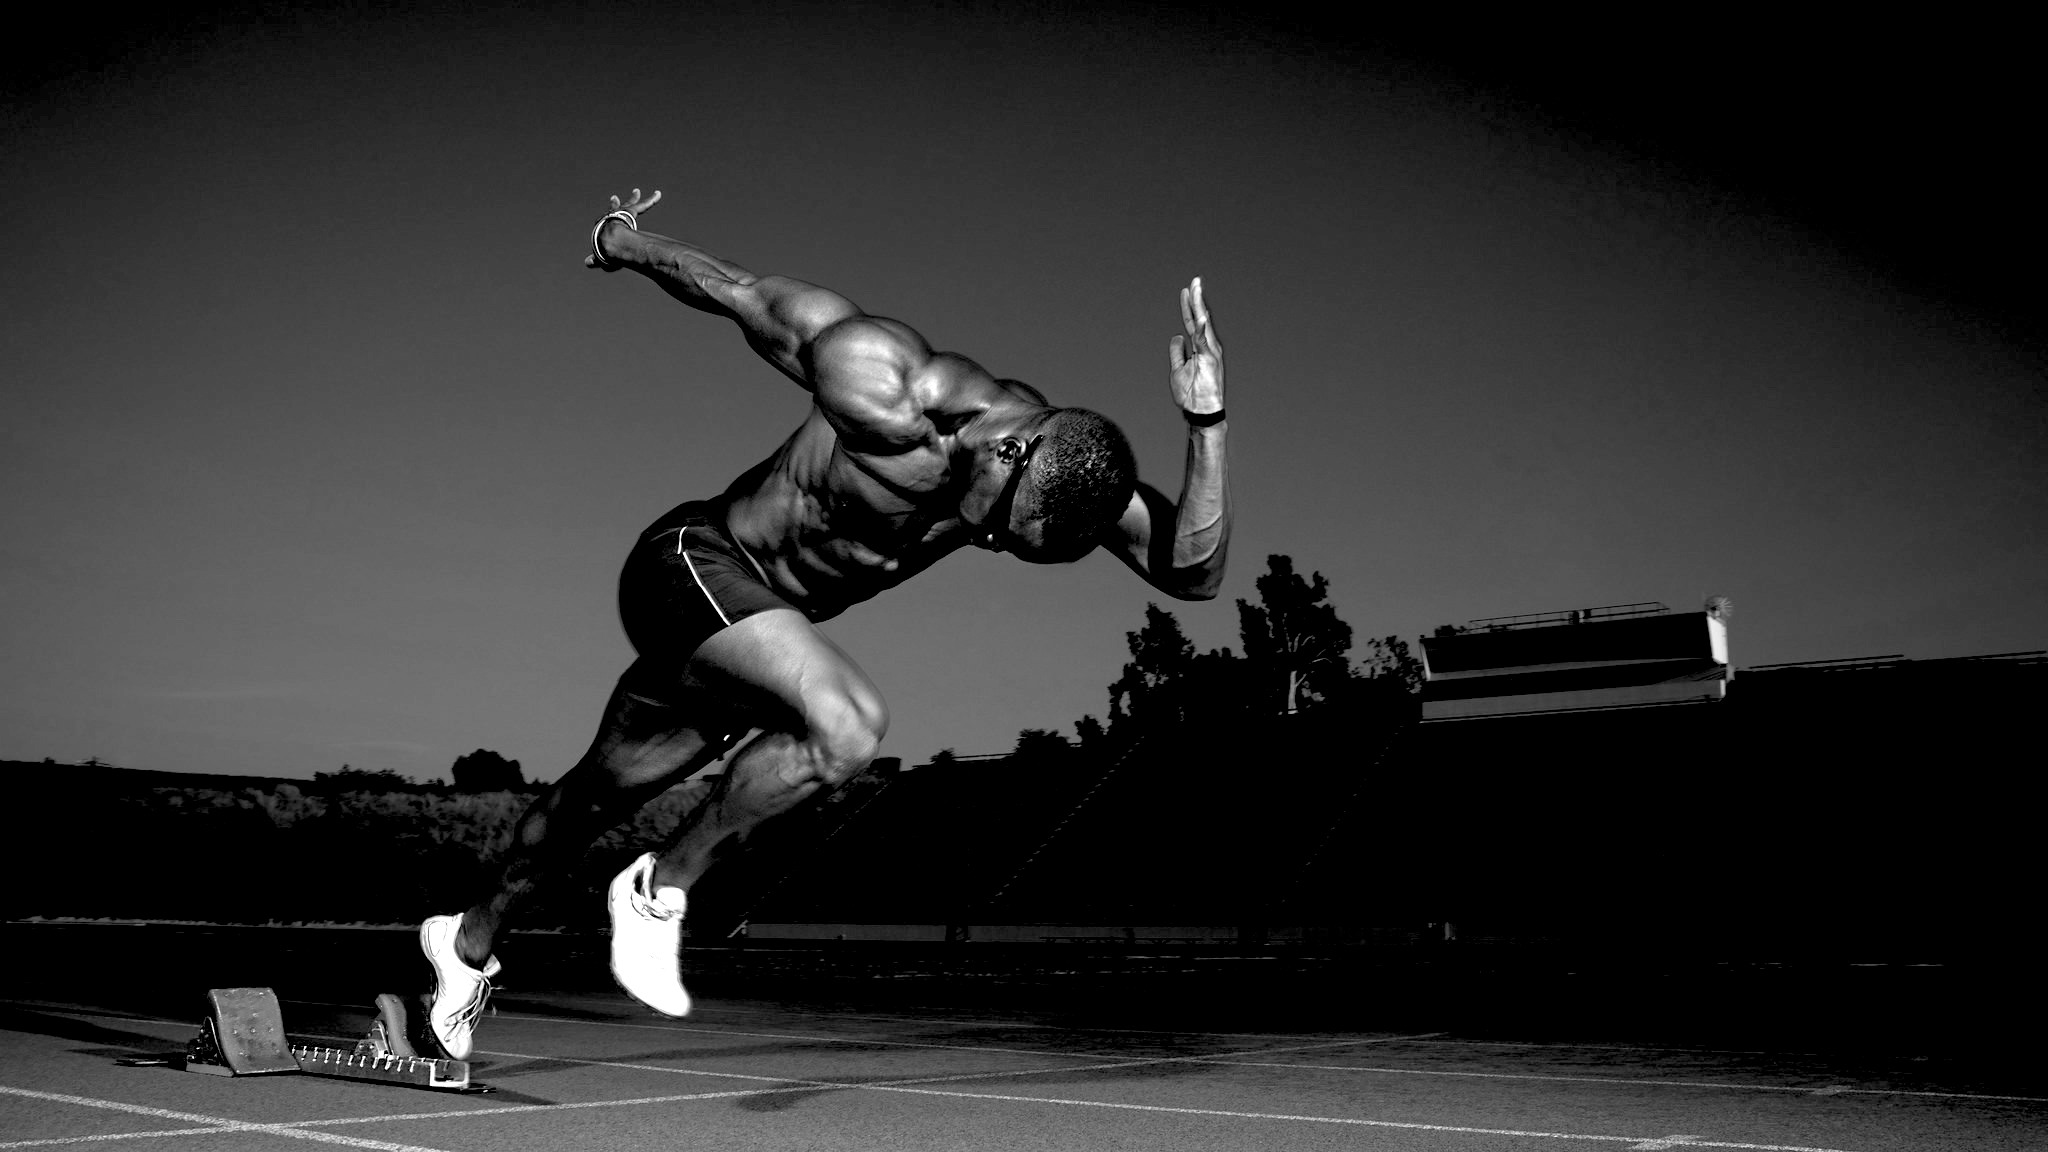 ssl urheilijan harjoittelu -